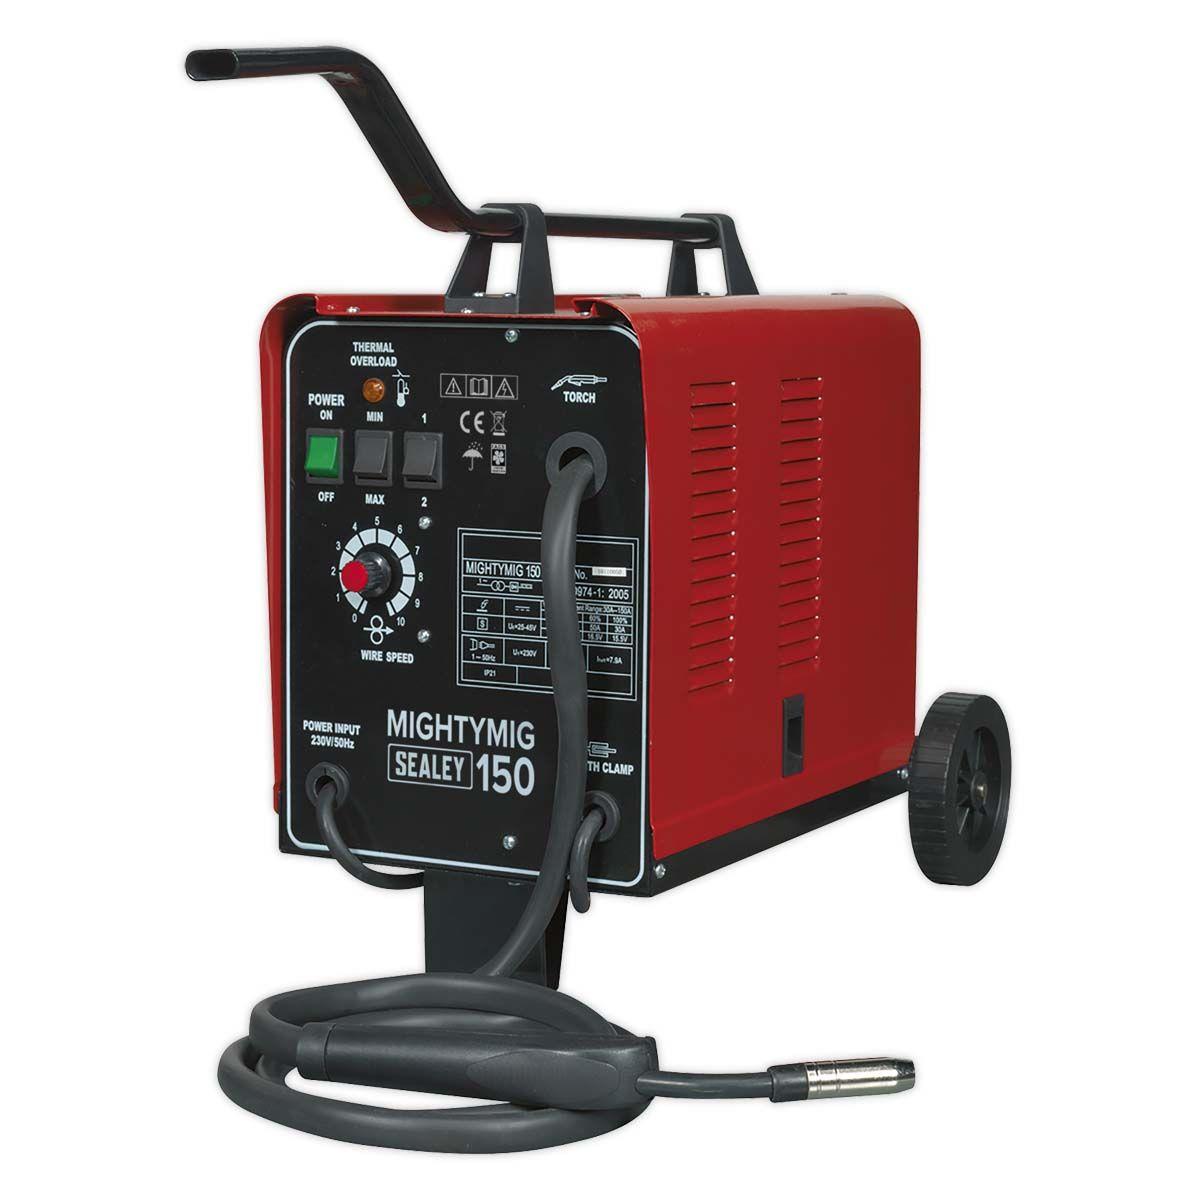 Sealey Mightymig Professional Gas/No-Gas MIG Welder 150Amp 230V